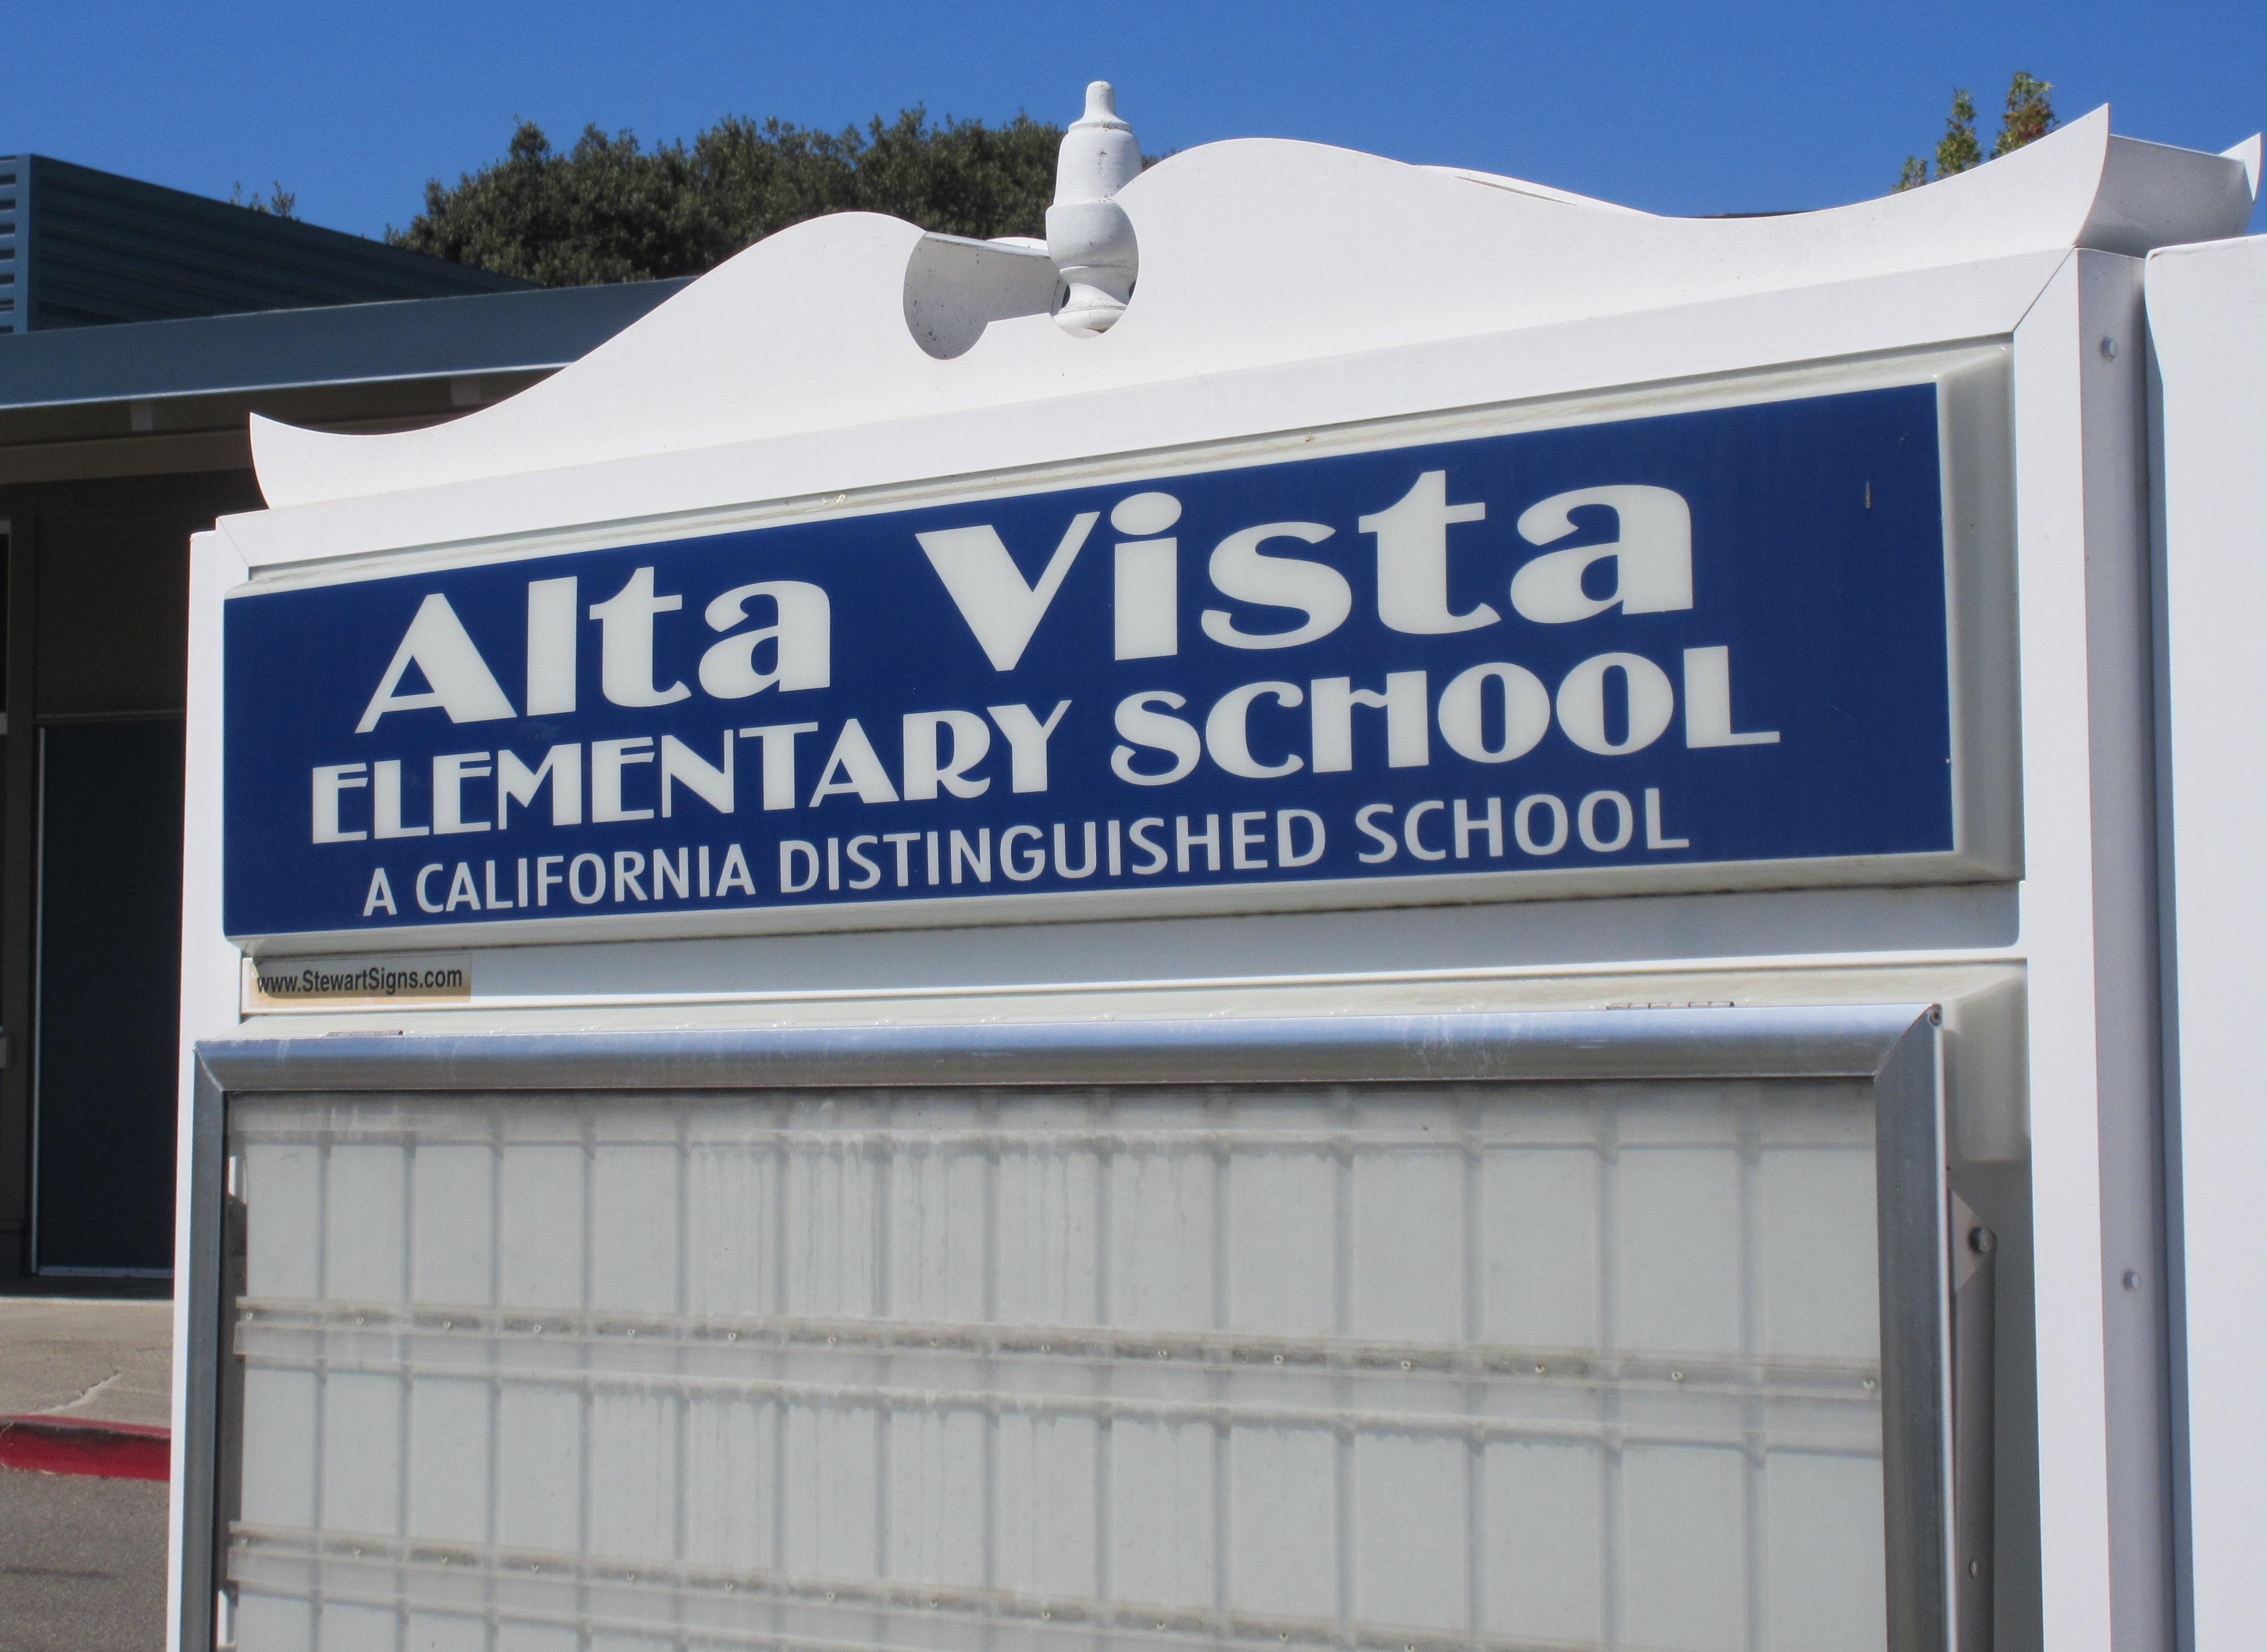 Welcome to Alta Vista Elementary School Image